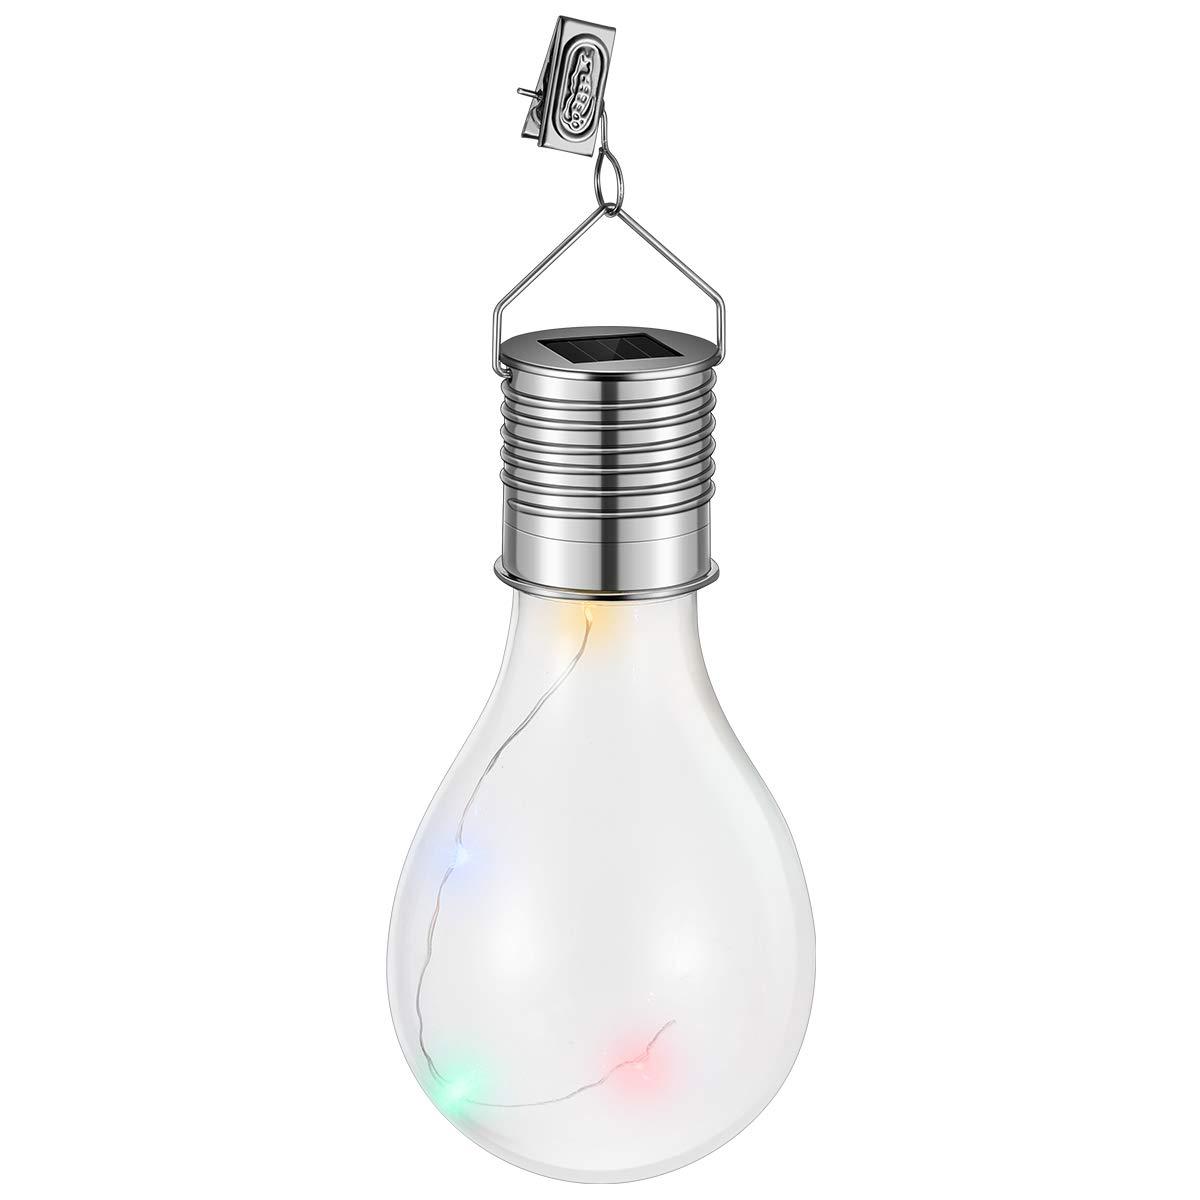 ledmomo Solar Lámparas Colgantes Agua Densidad esféricos Bombilla LED luces lámpara para exterior jardín camping (transparente Carcasa con cuatro colores luz): Amazon.es: Iluminación